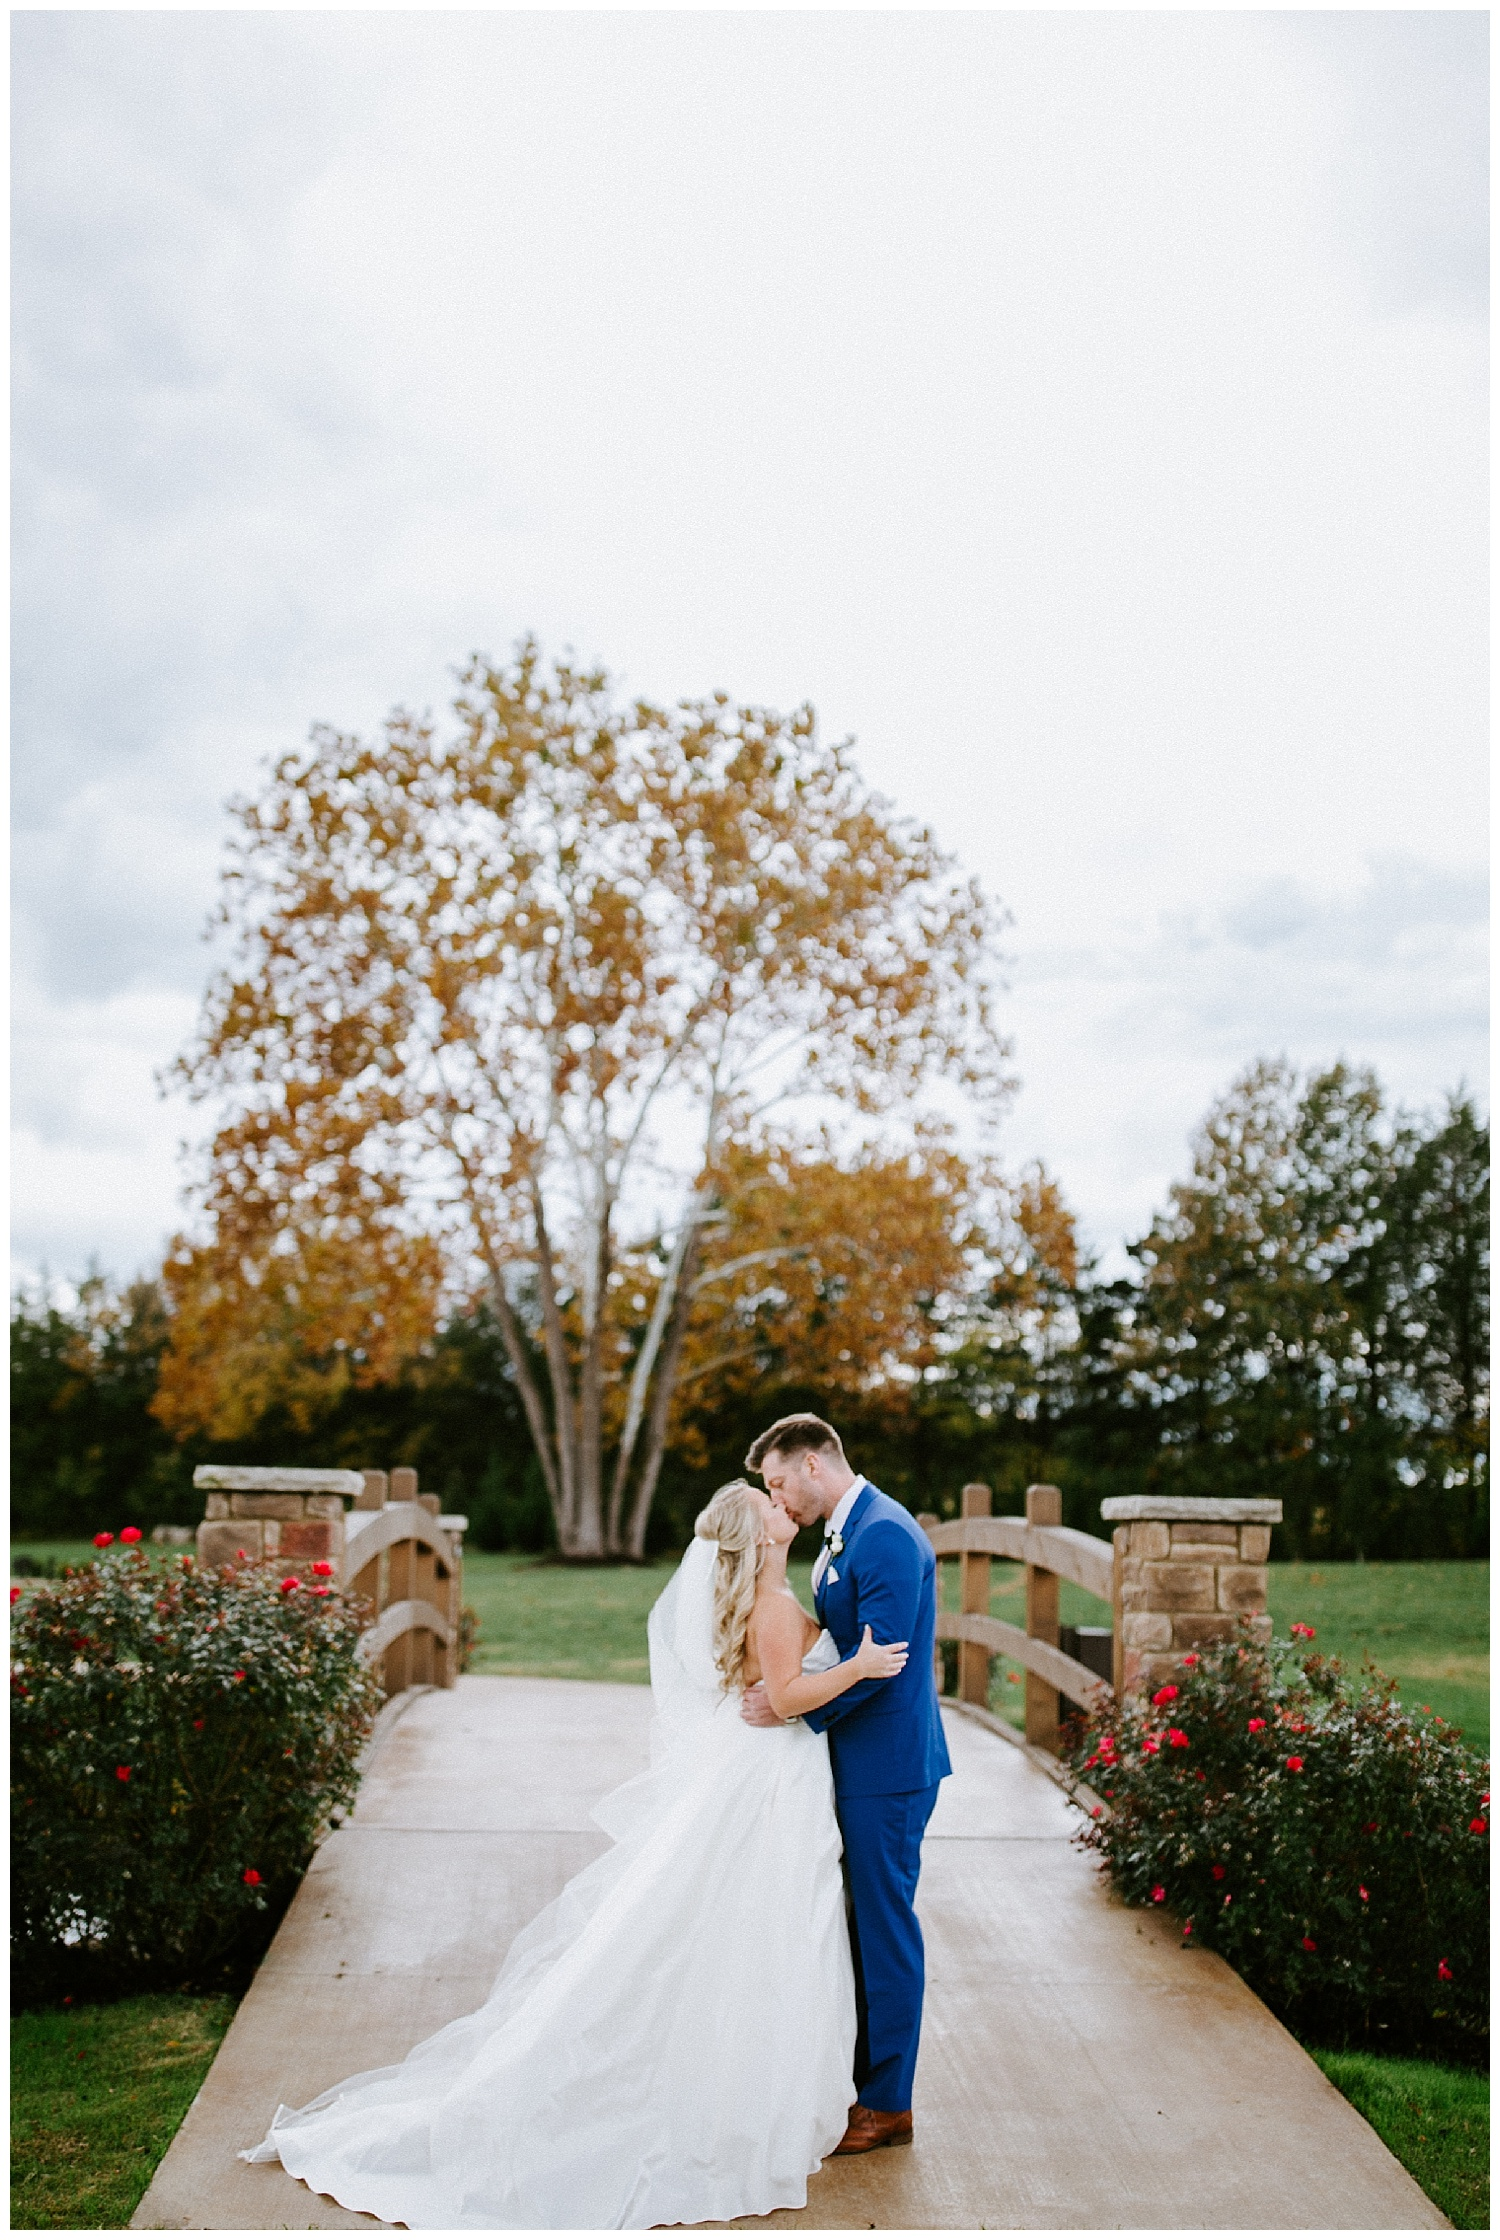 classy-wedding-sycamore_farms-nashville-tn2019-01-22_0024.jpg